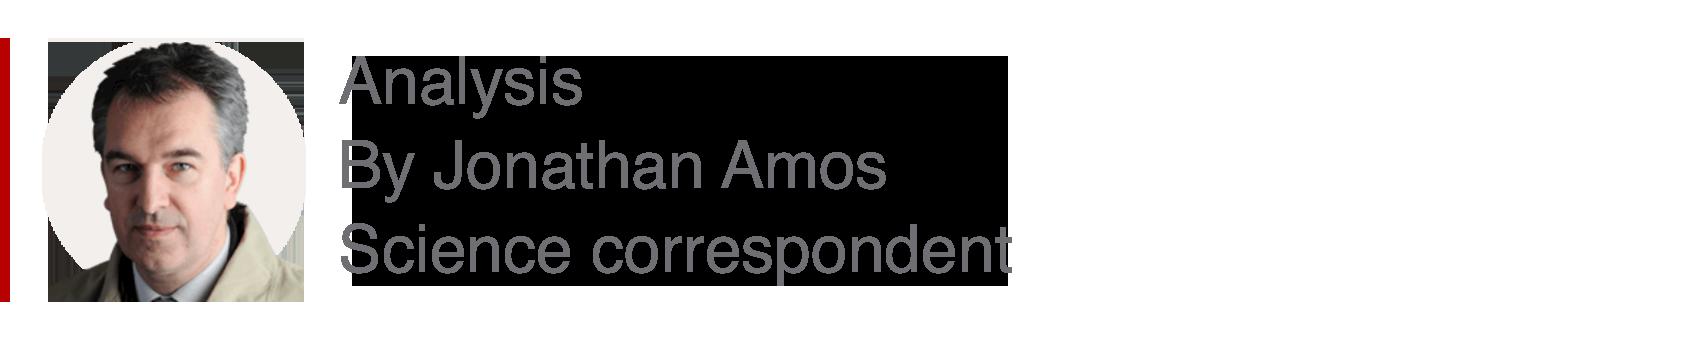 Analysis box by Jonathan Amos, science correspondent